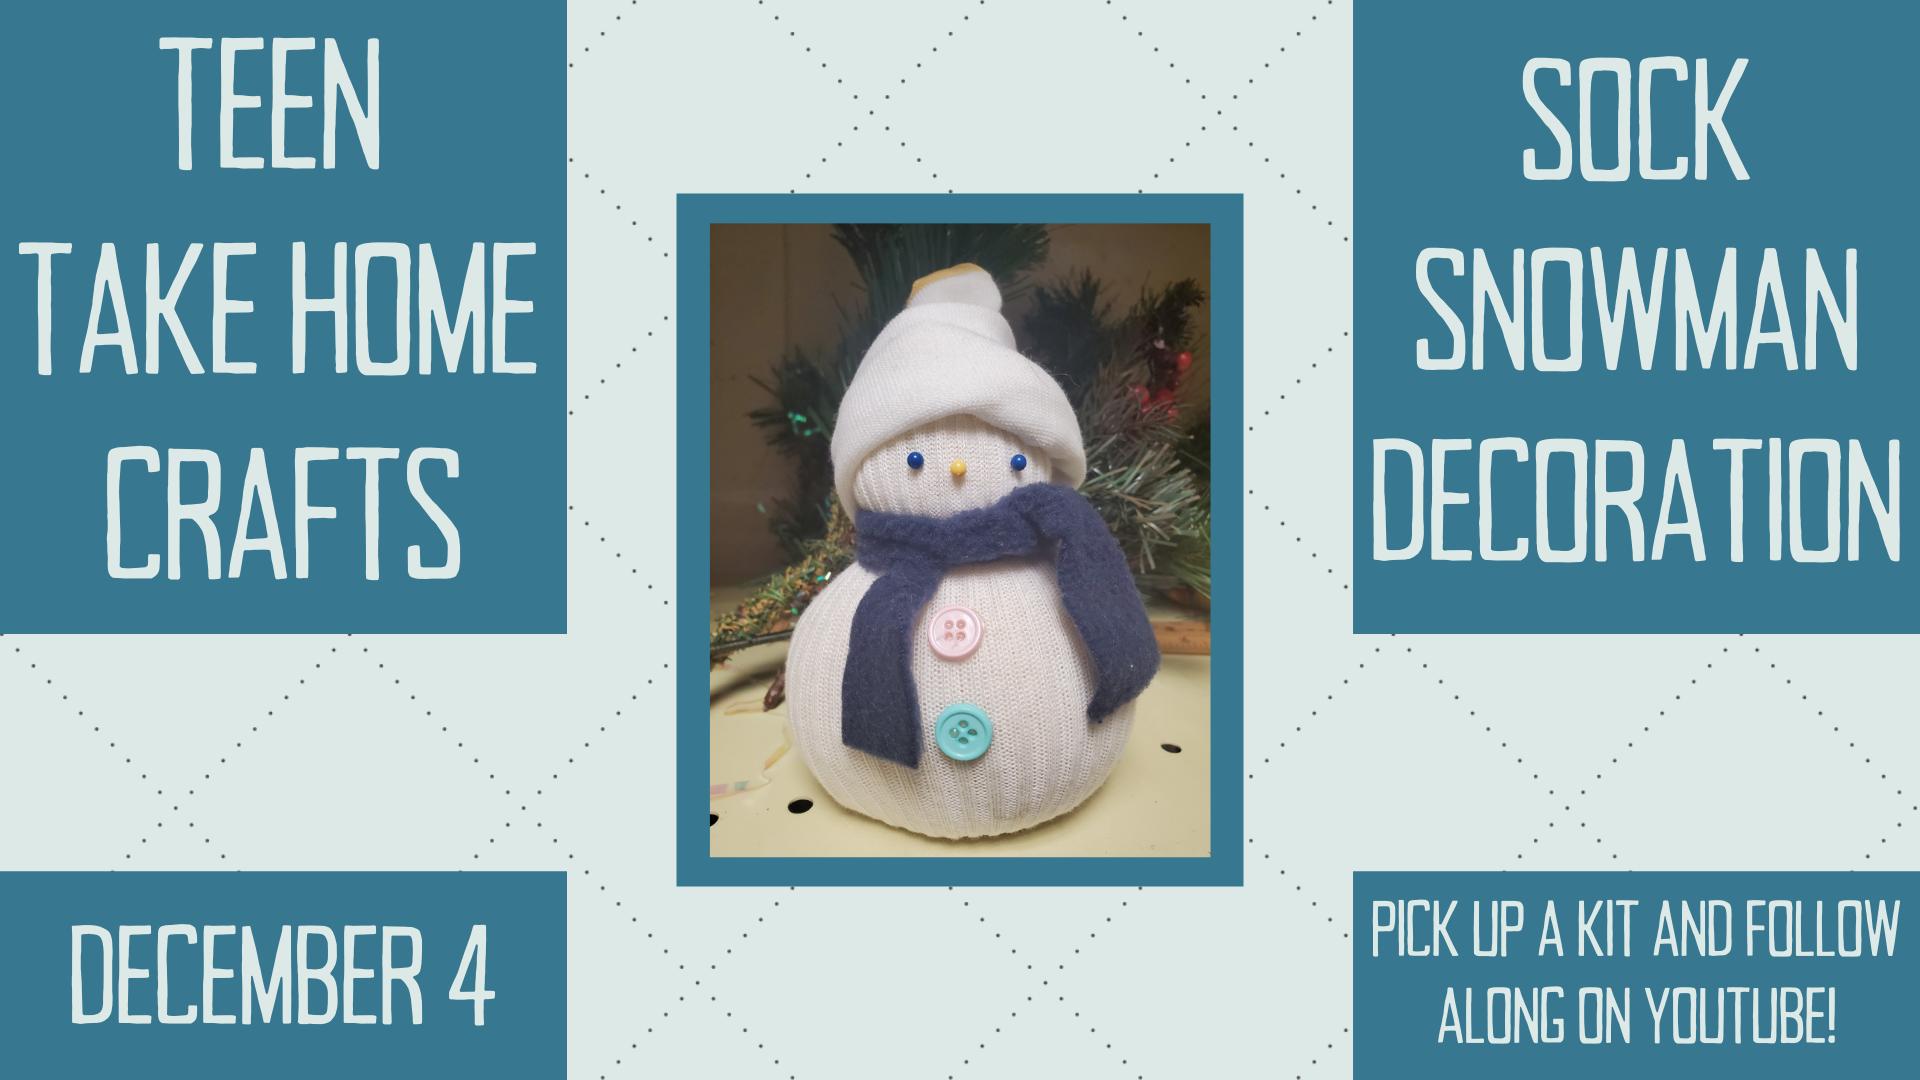 Teen Take Home Craft: Sock Snowman